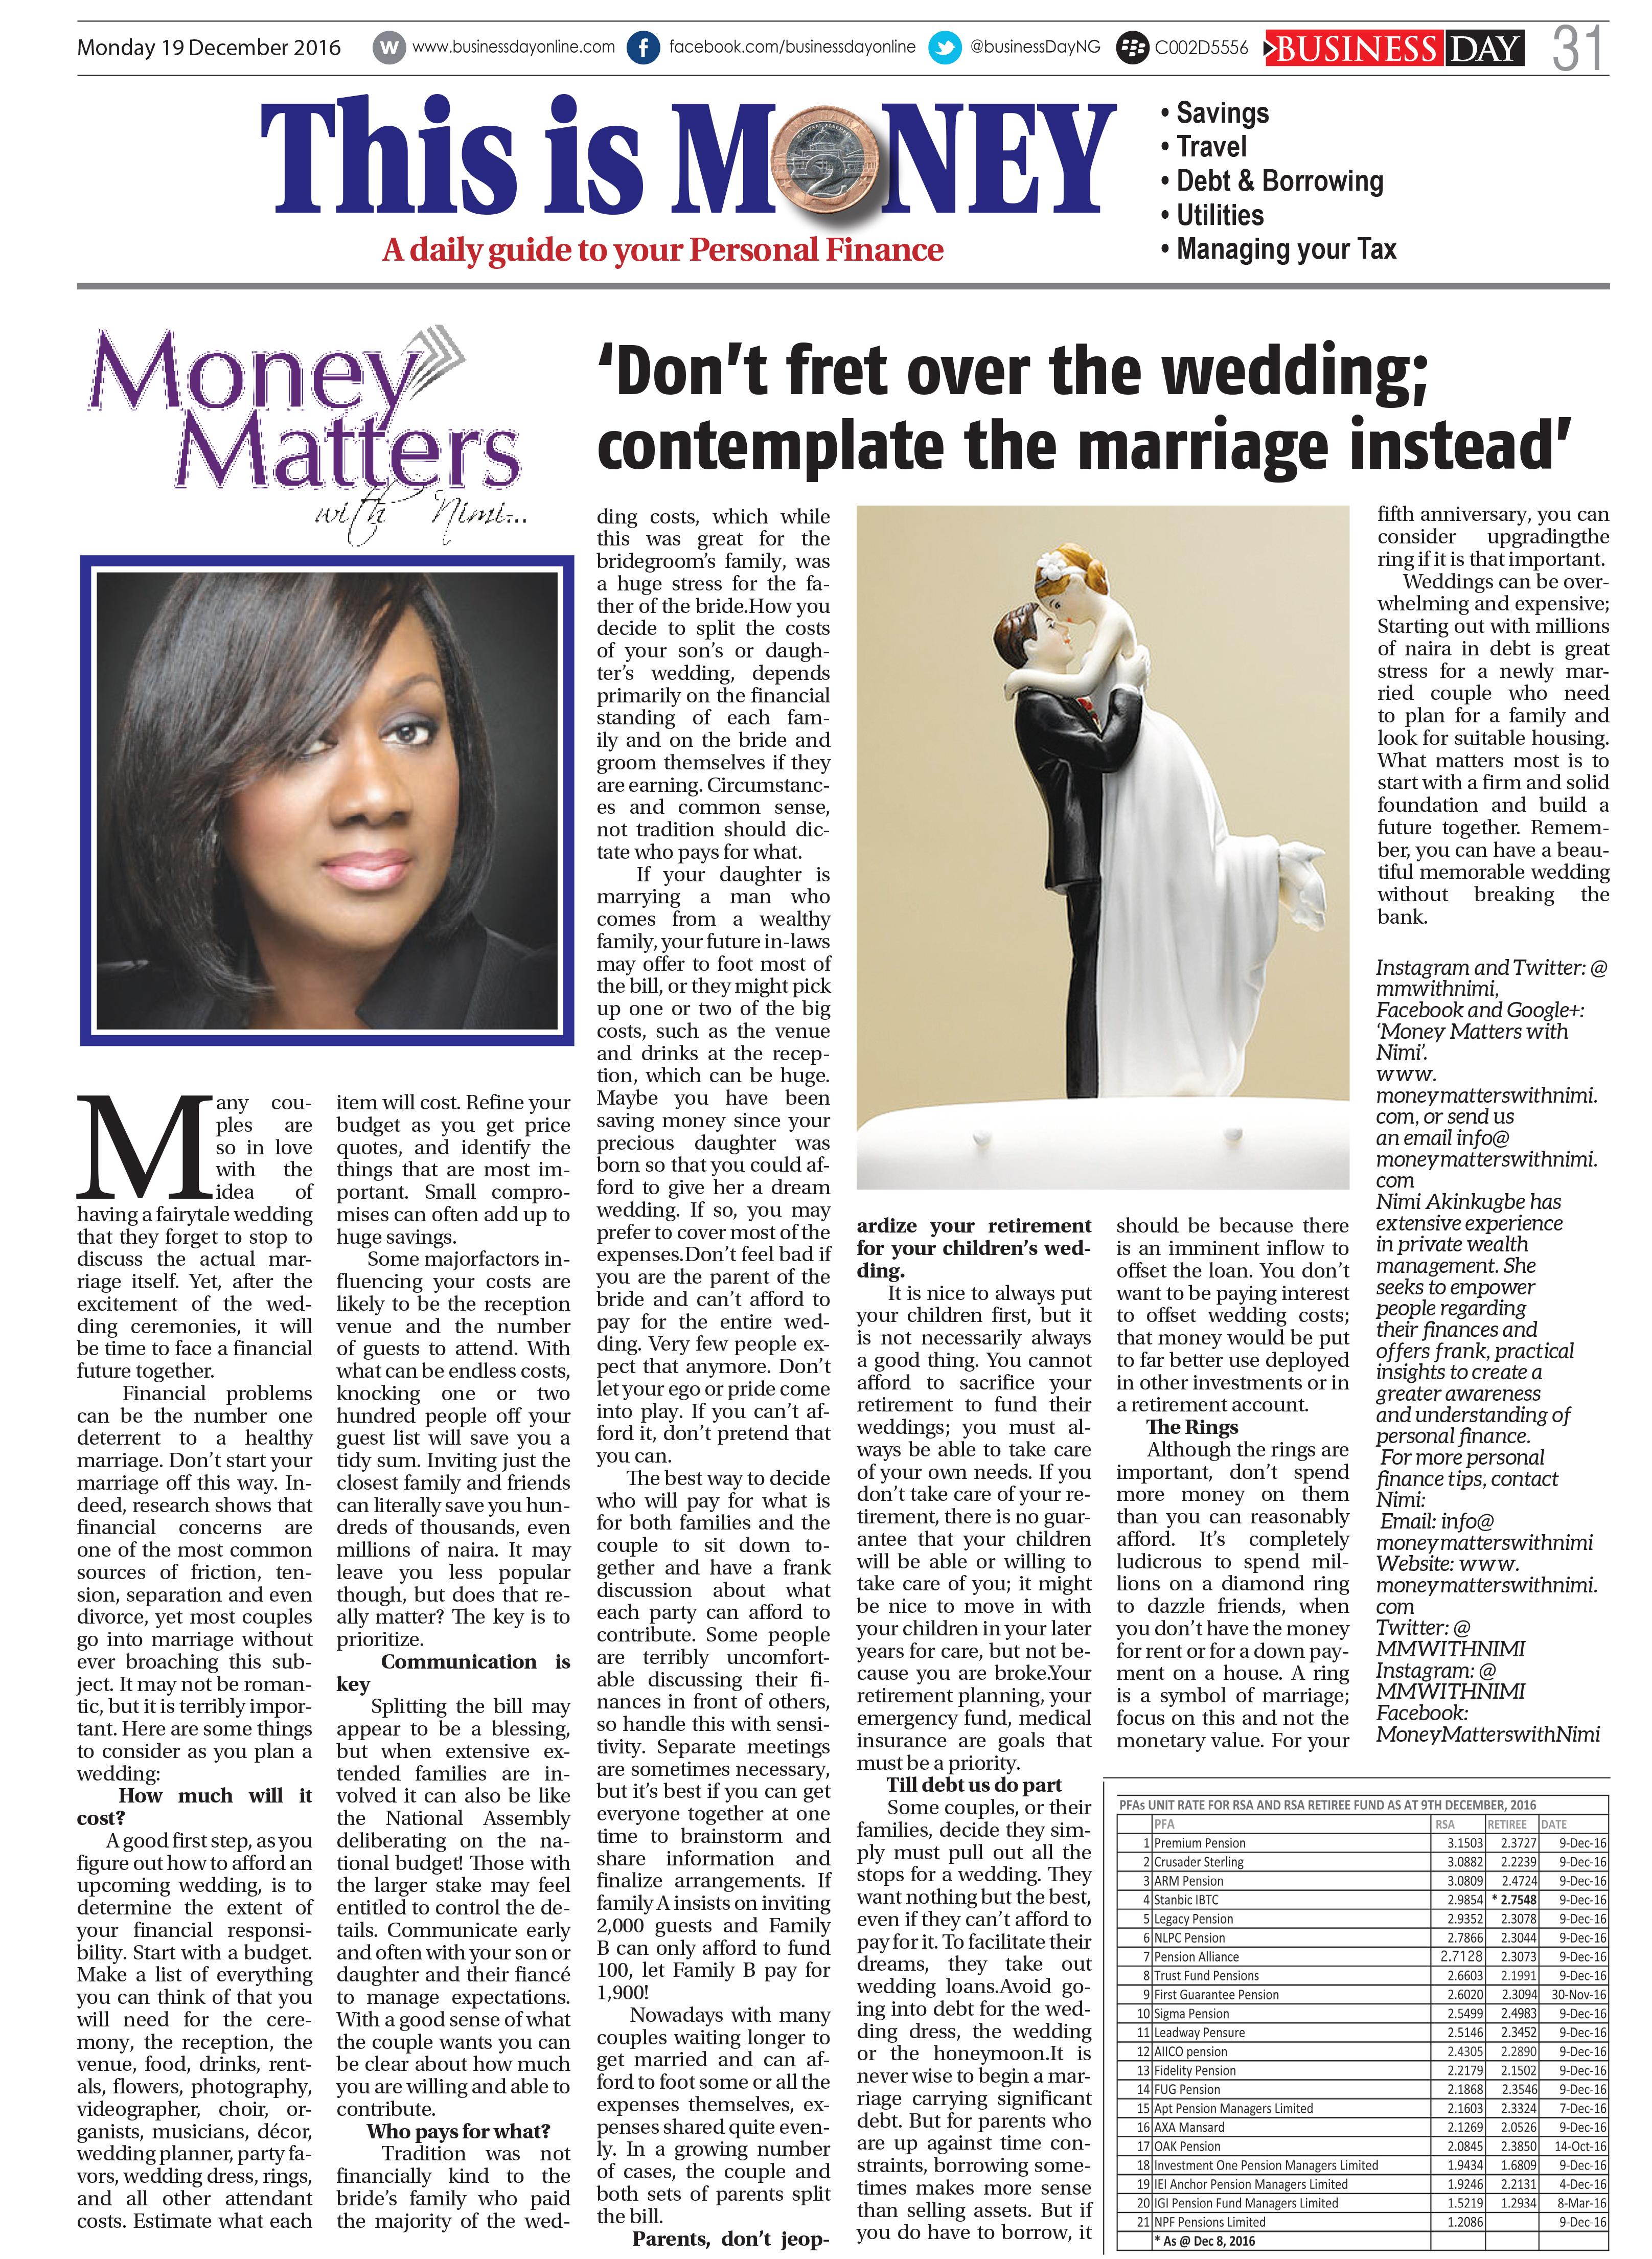 page-31-money-19-dec-2016